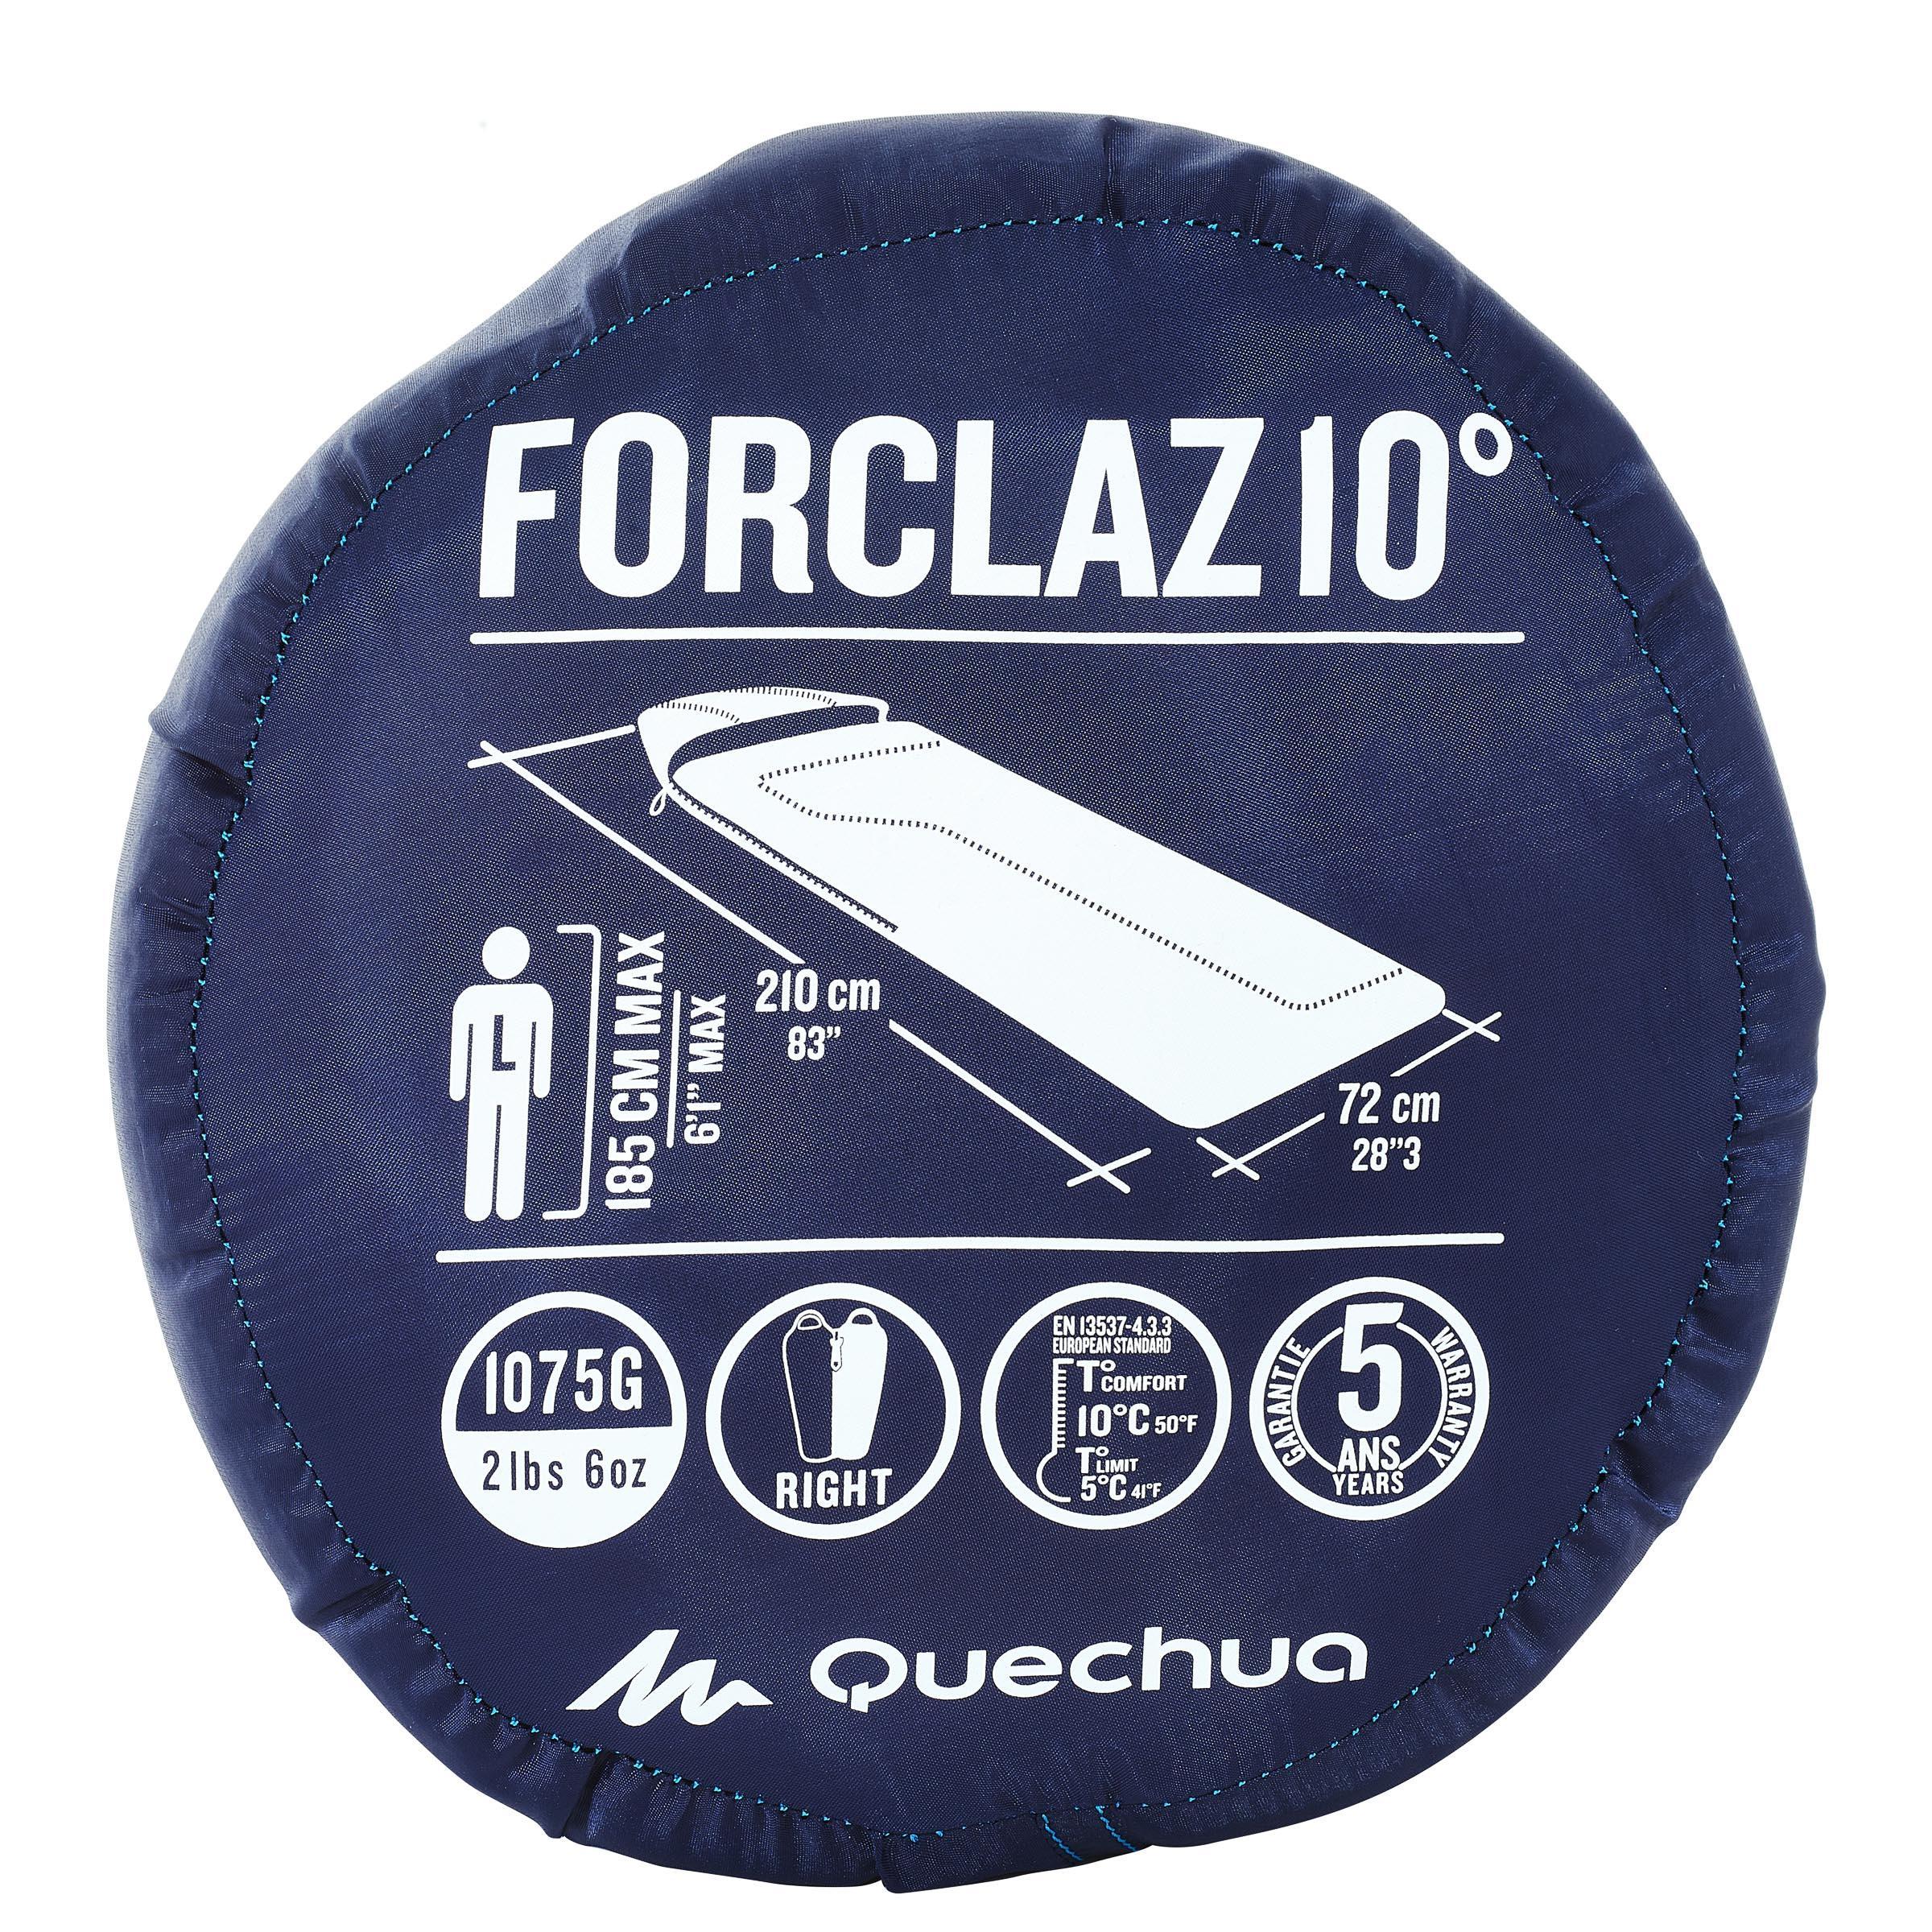 Forclaz 10° Camping Sleeping Bag